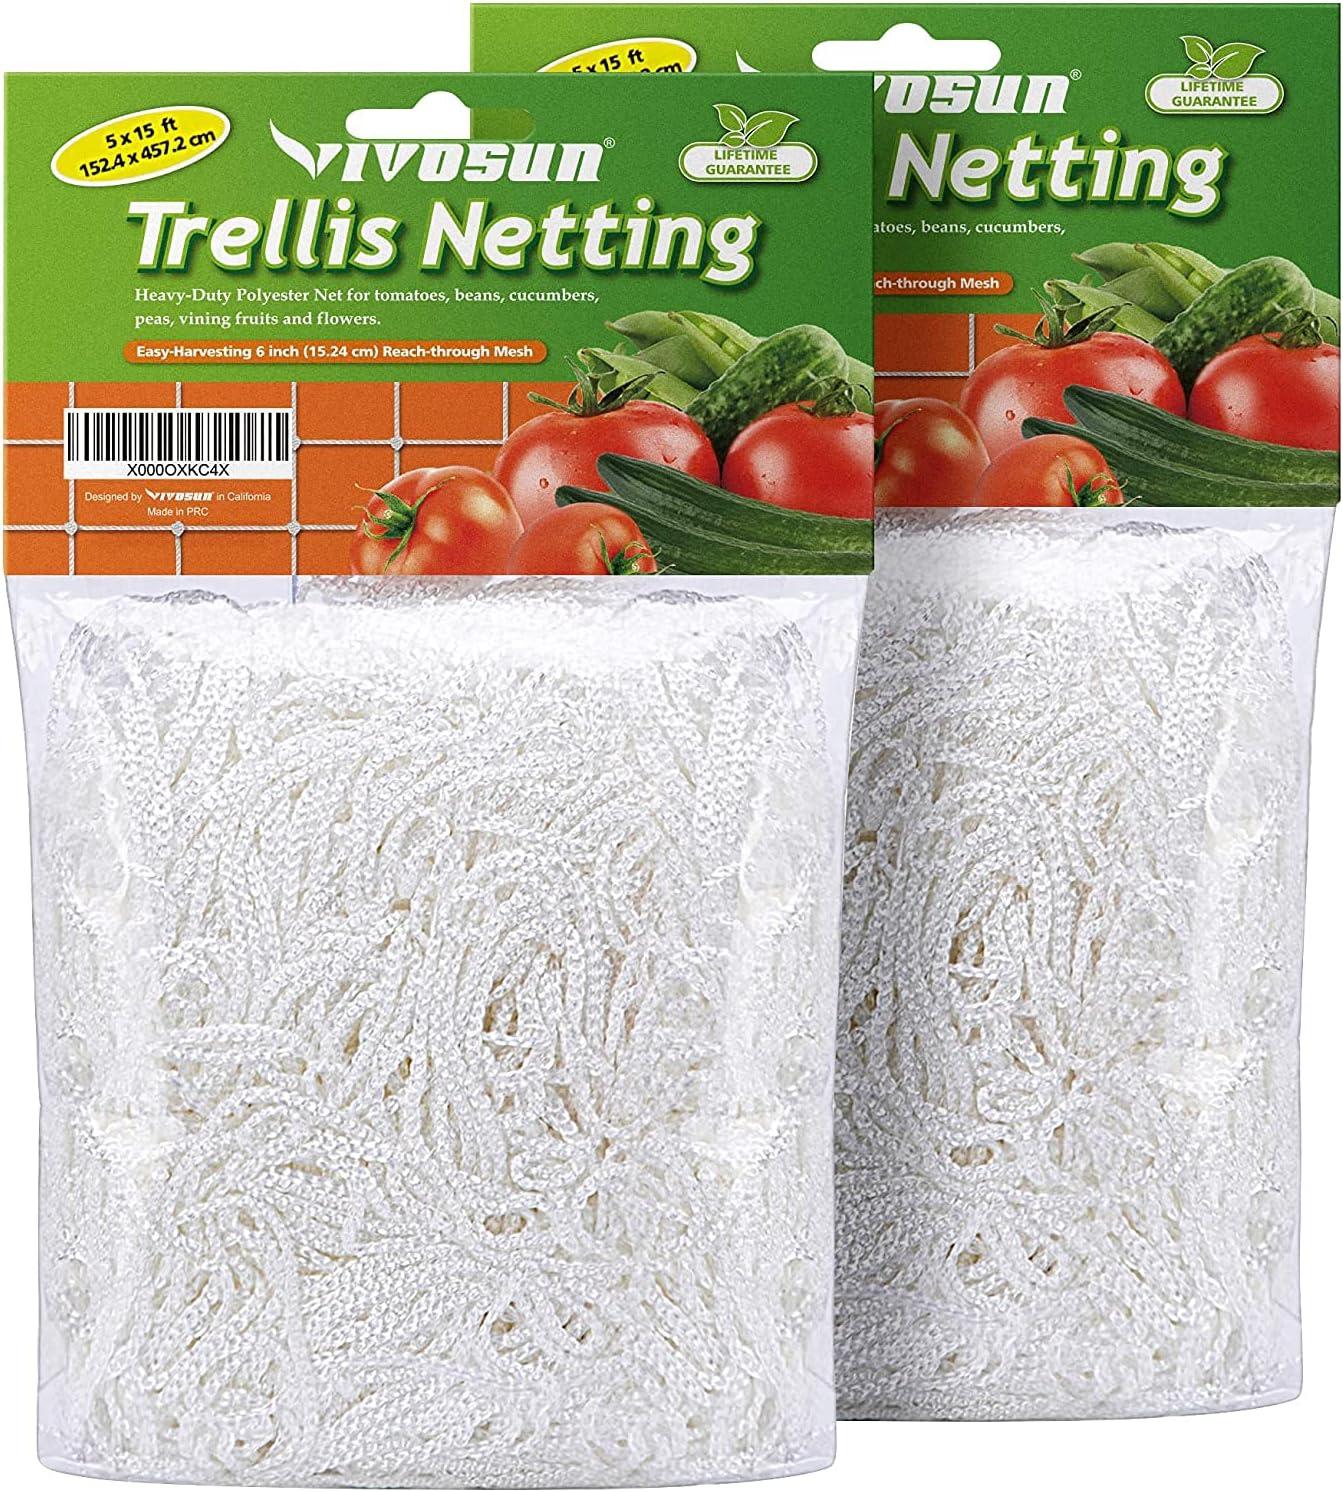 VIVOSUN Heavy-duty Polyester Plant Trellis Netting 5 x 15ft, 1 Pack : Patio, Lawn & Garden